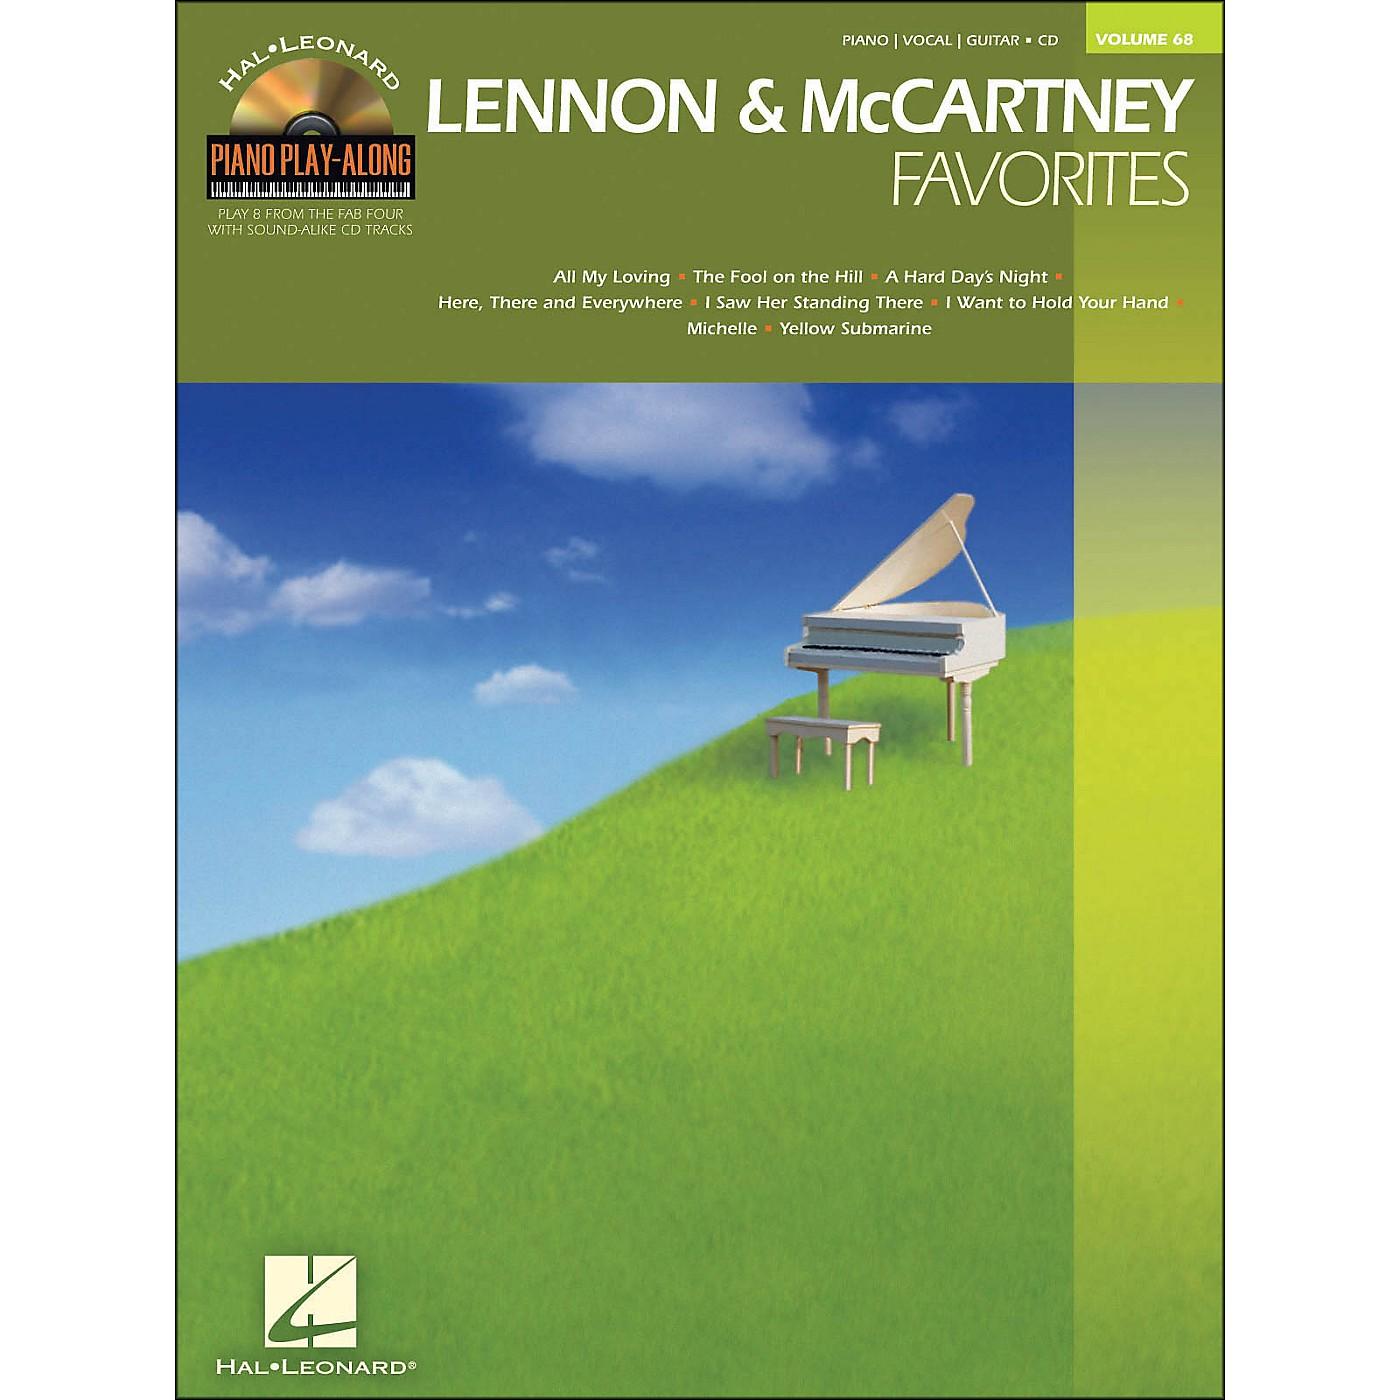 Hal Leonard Lennon & McCartney Favorites - Piano Play-Along Volume 68 (CD/Pkg) arranged for piano, vocal, and guitar (P/V/G) thumbnail